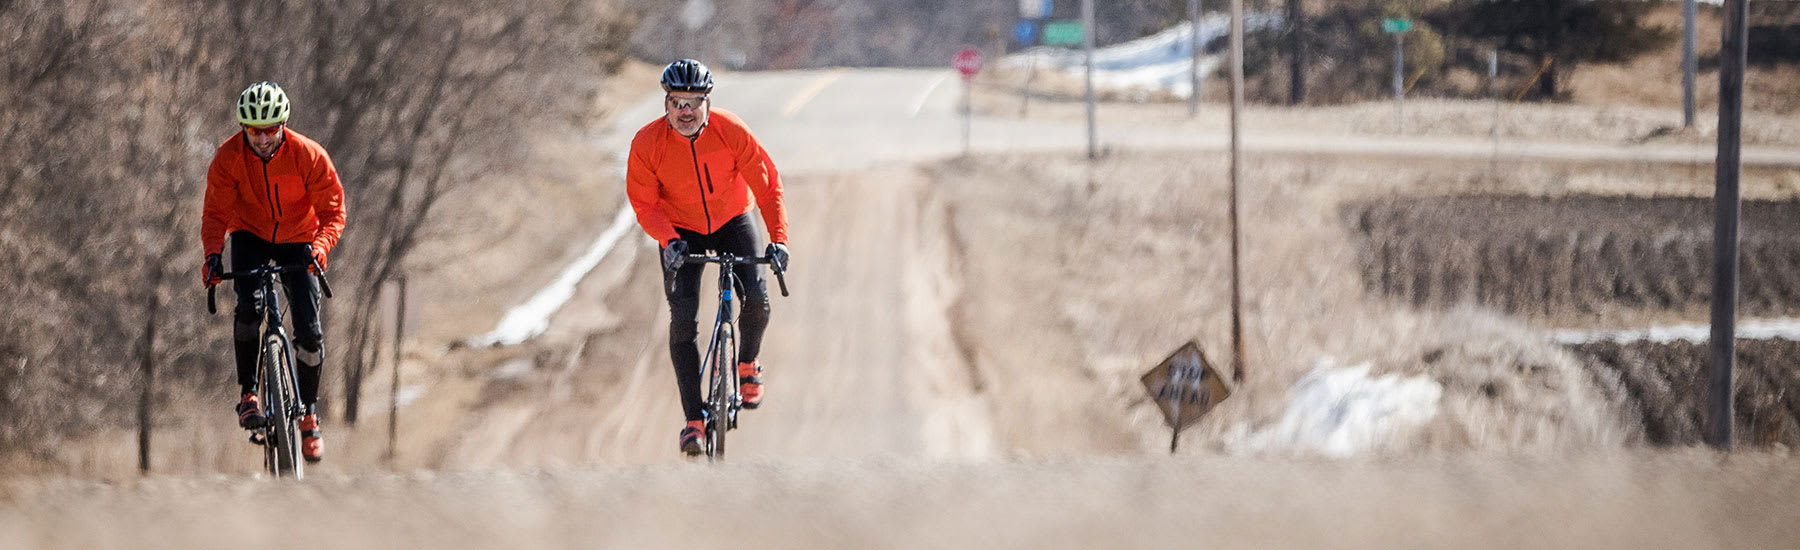 Framed Bikes, BMX Bikes